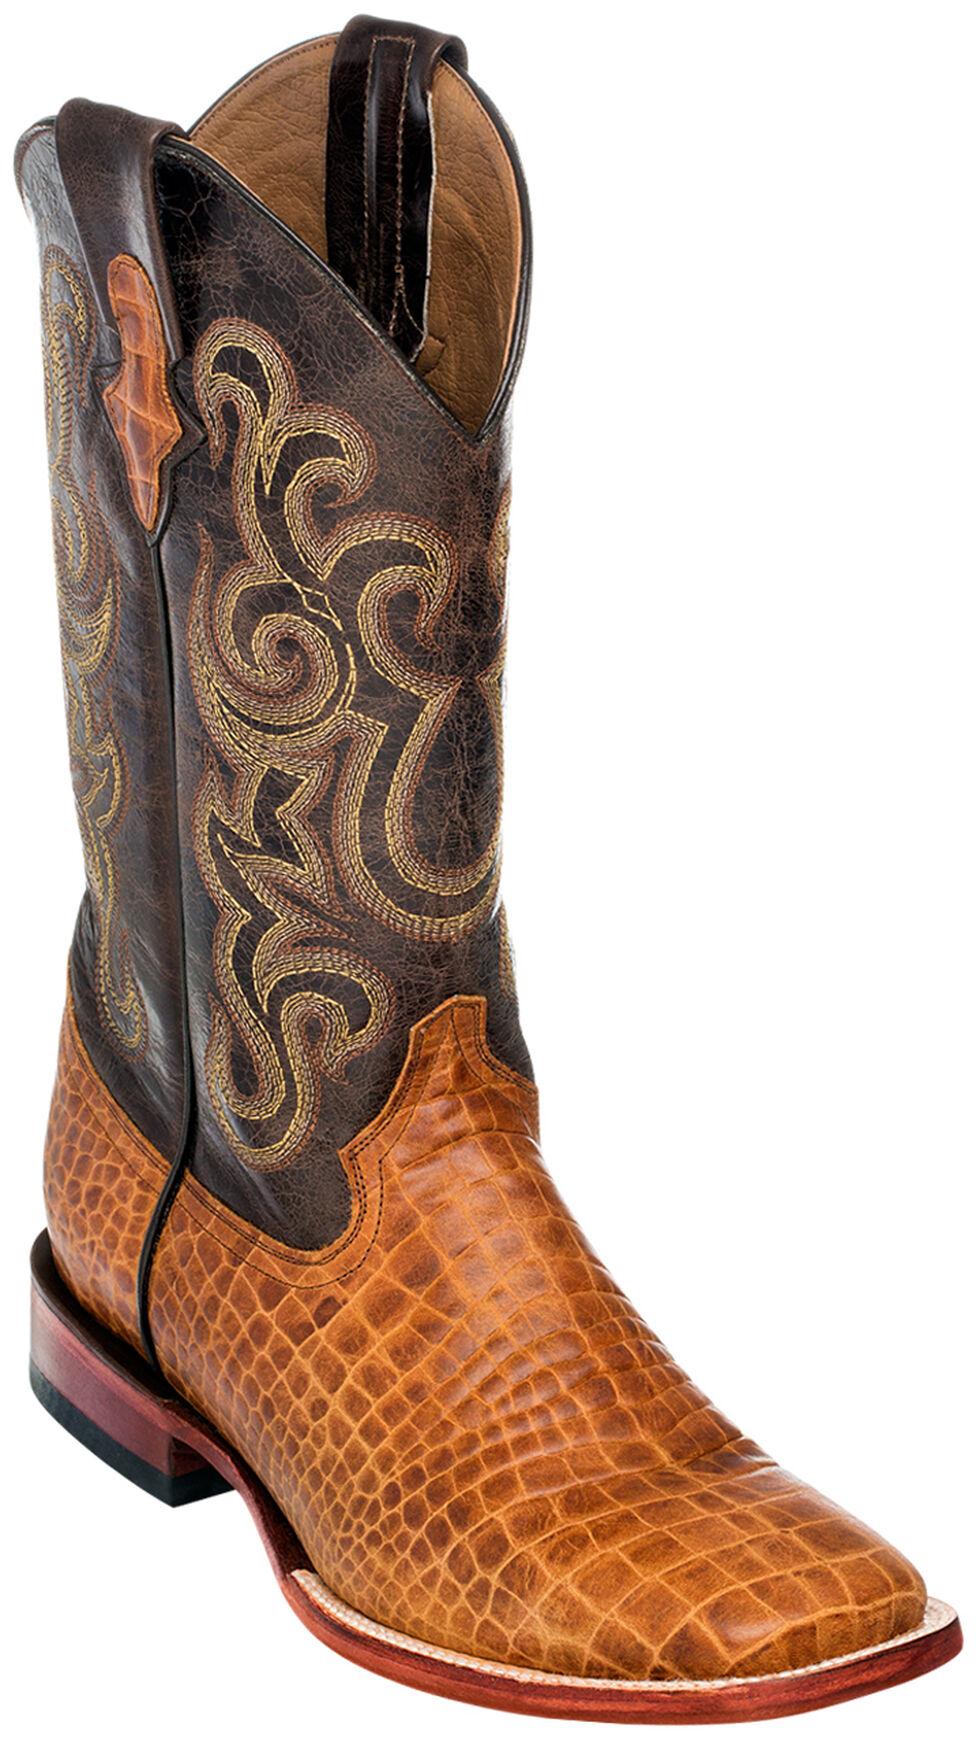 Ferrini Men's Honey Brown Caiman Belly Print Western Boots - Square Toe , Honey, hi-res